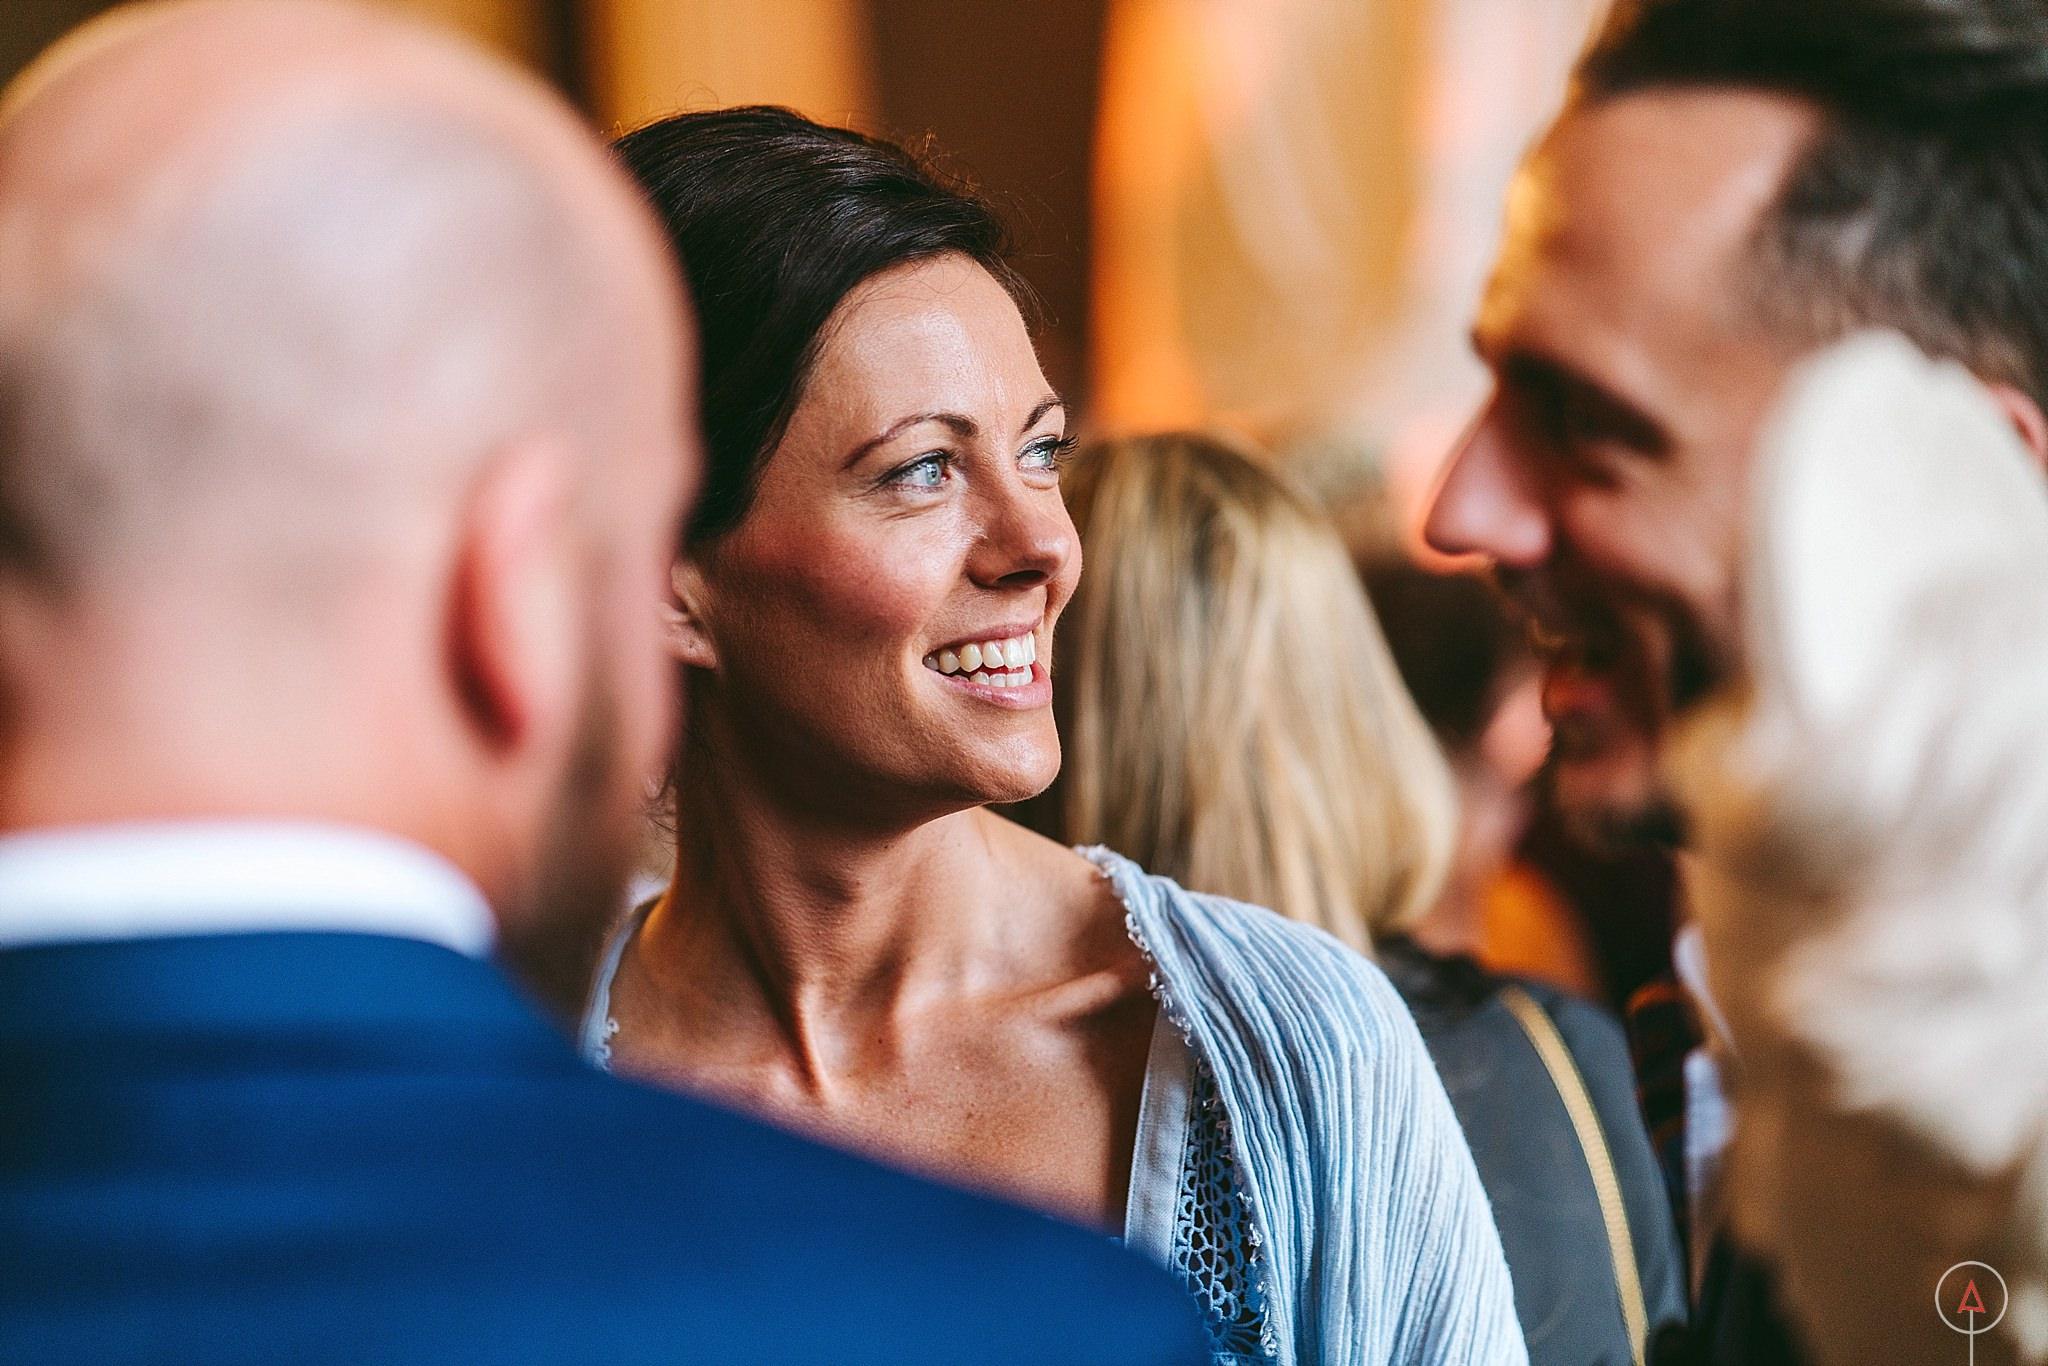 cardiff-wedding-photographer-aga-tomaszek_0261